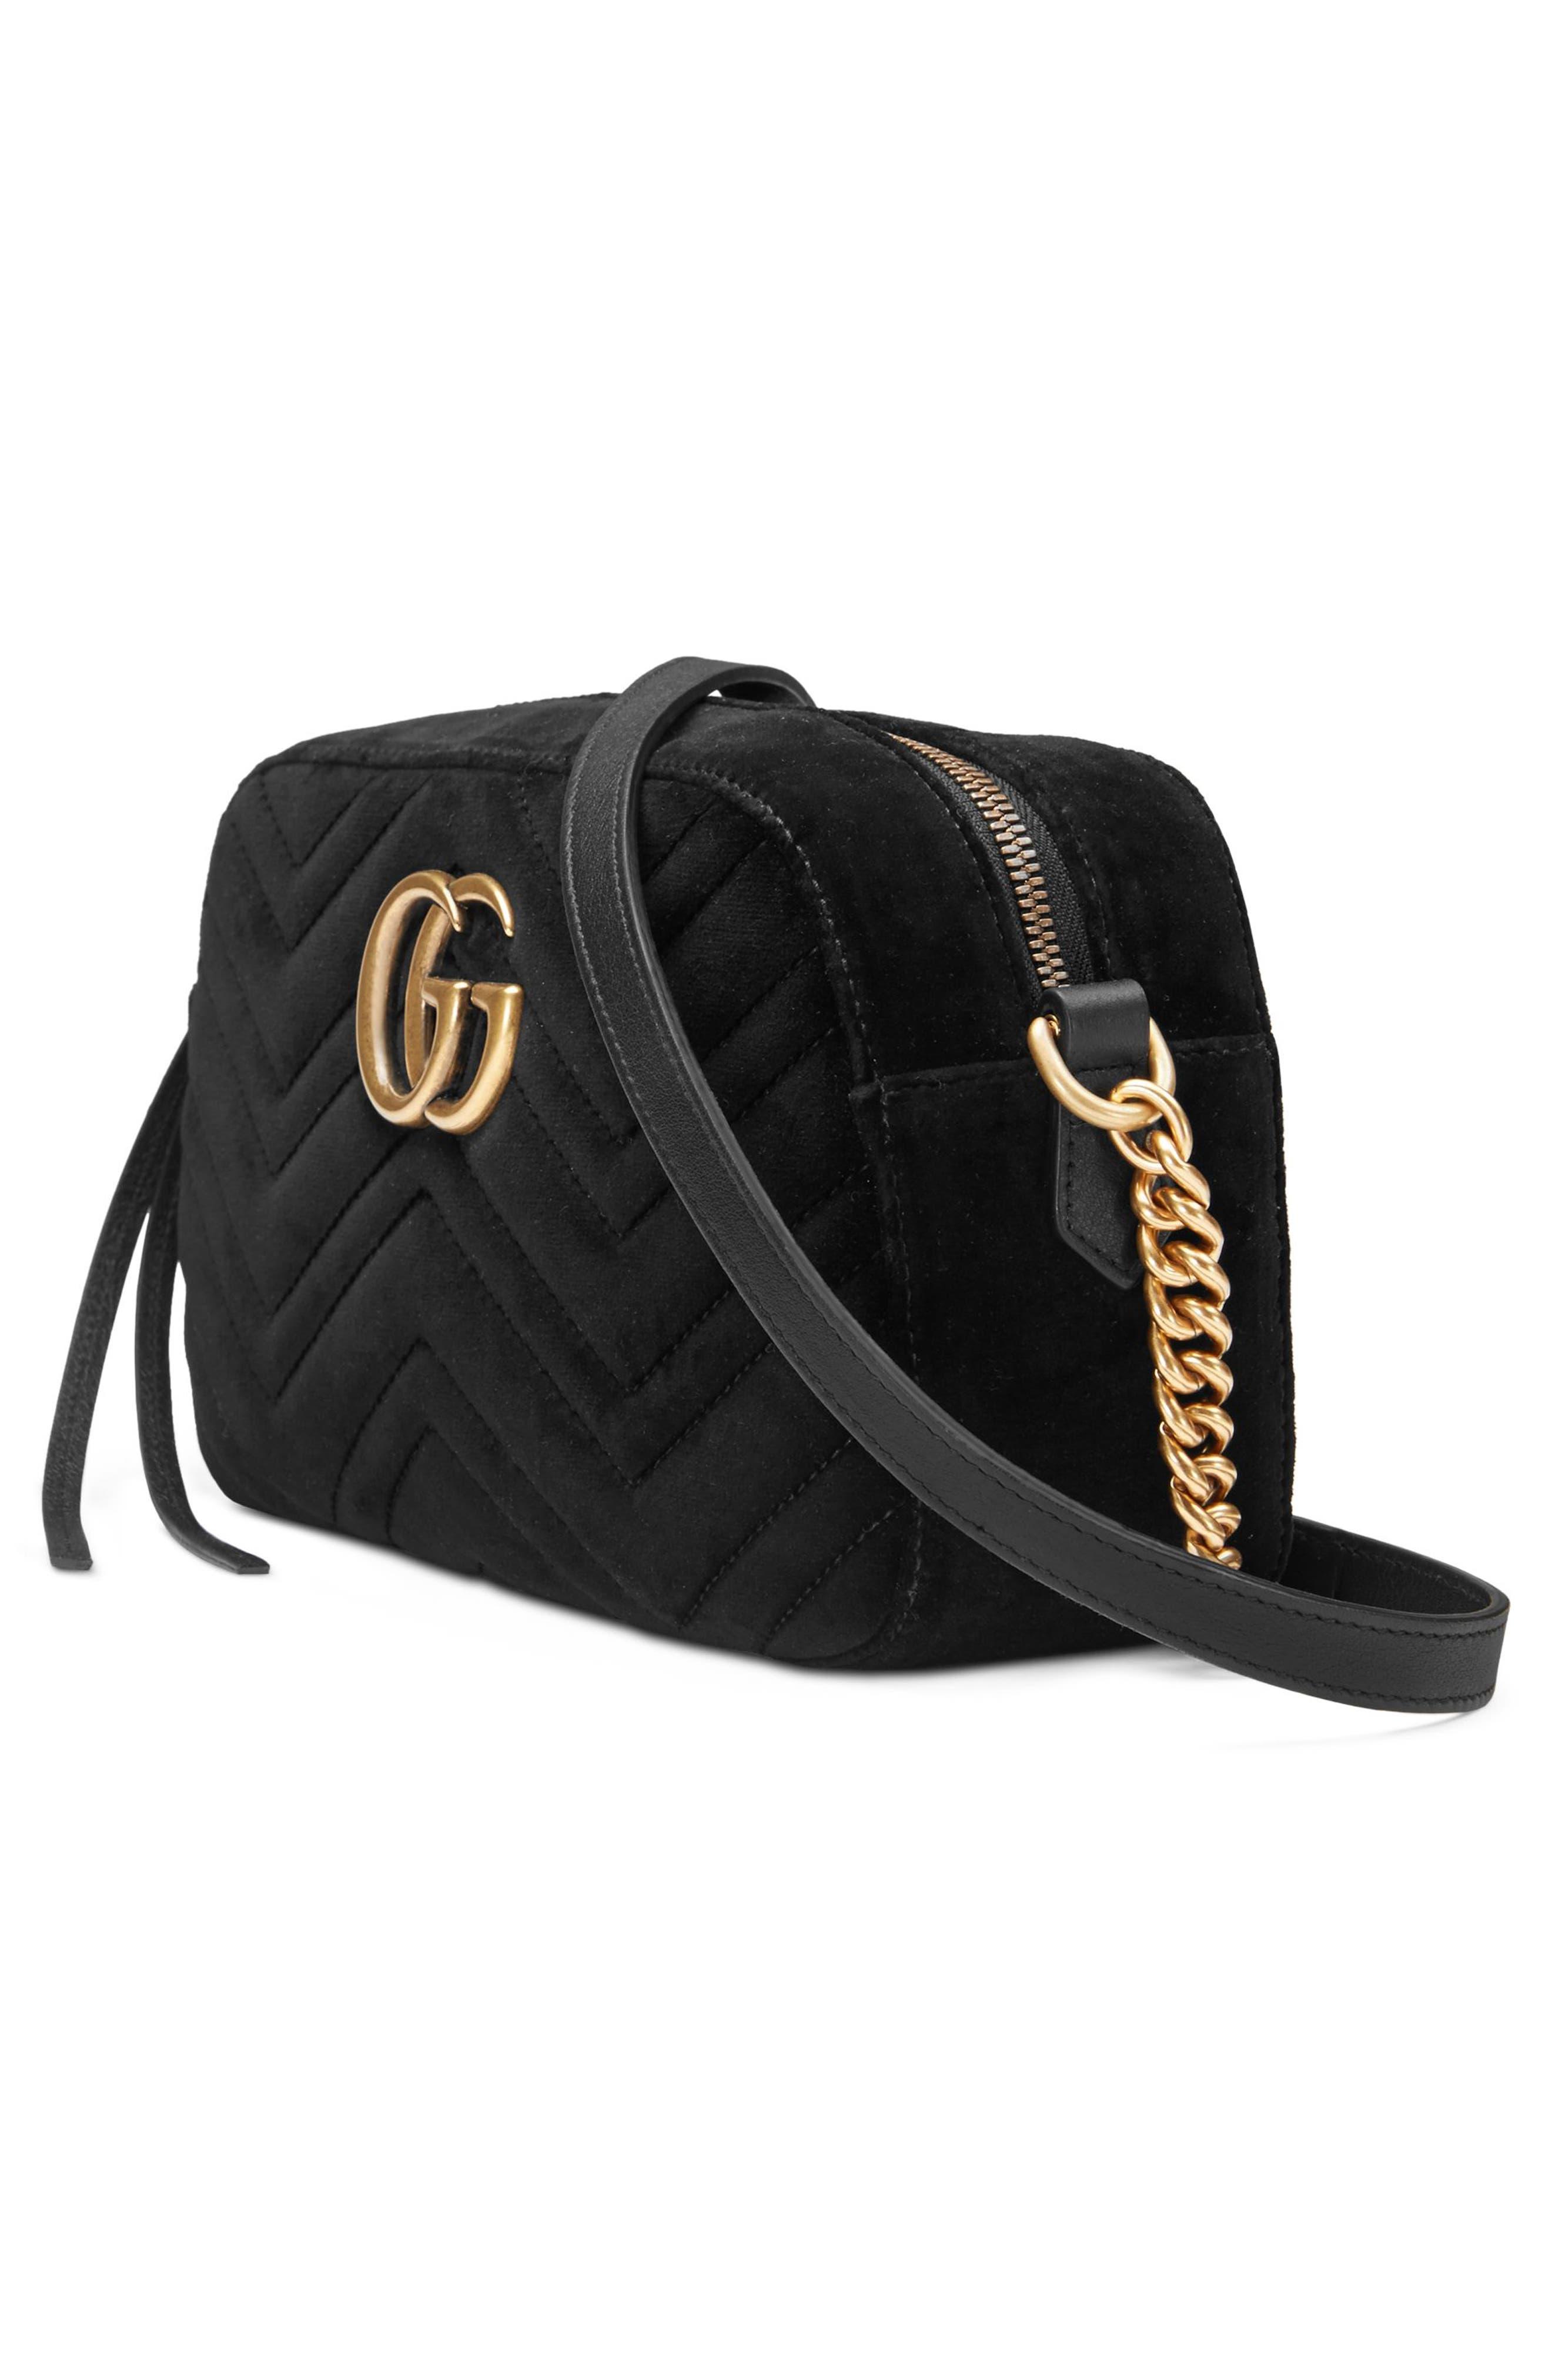 GUCCI, Small GG Marmont 2.0 Matelassé Velvet Shoulder Bag, Alternate thumbnail 4, color, NERO/ NERO